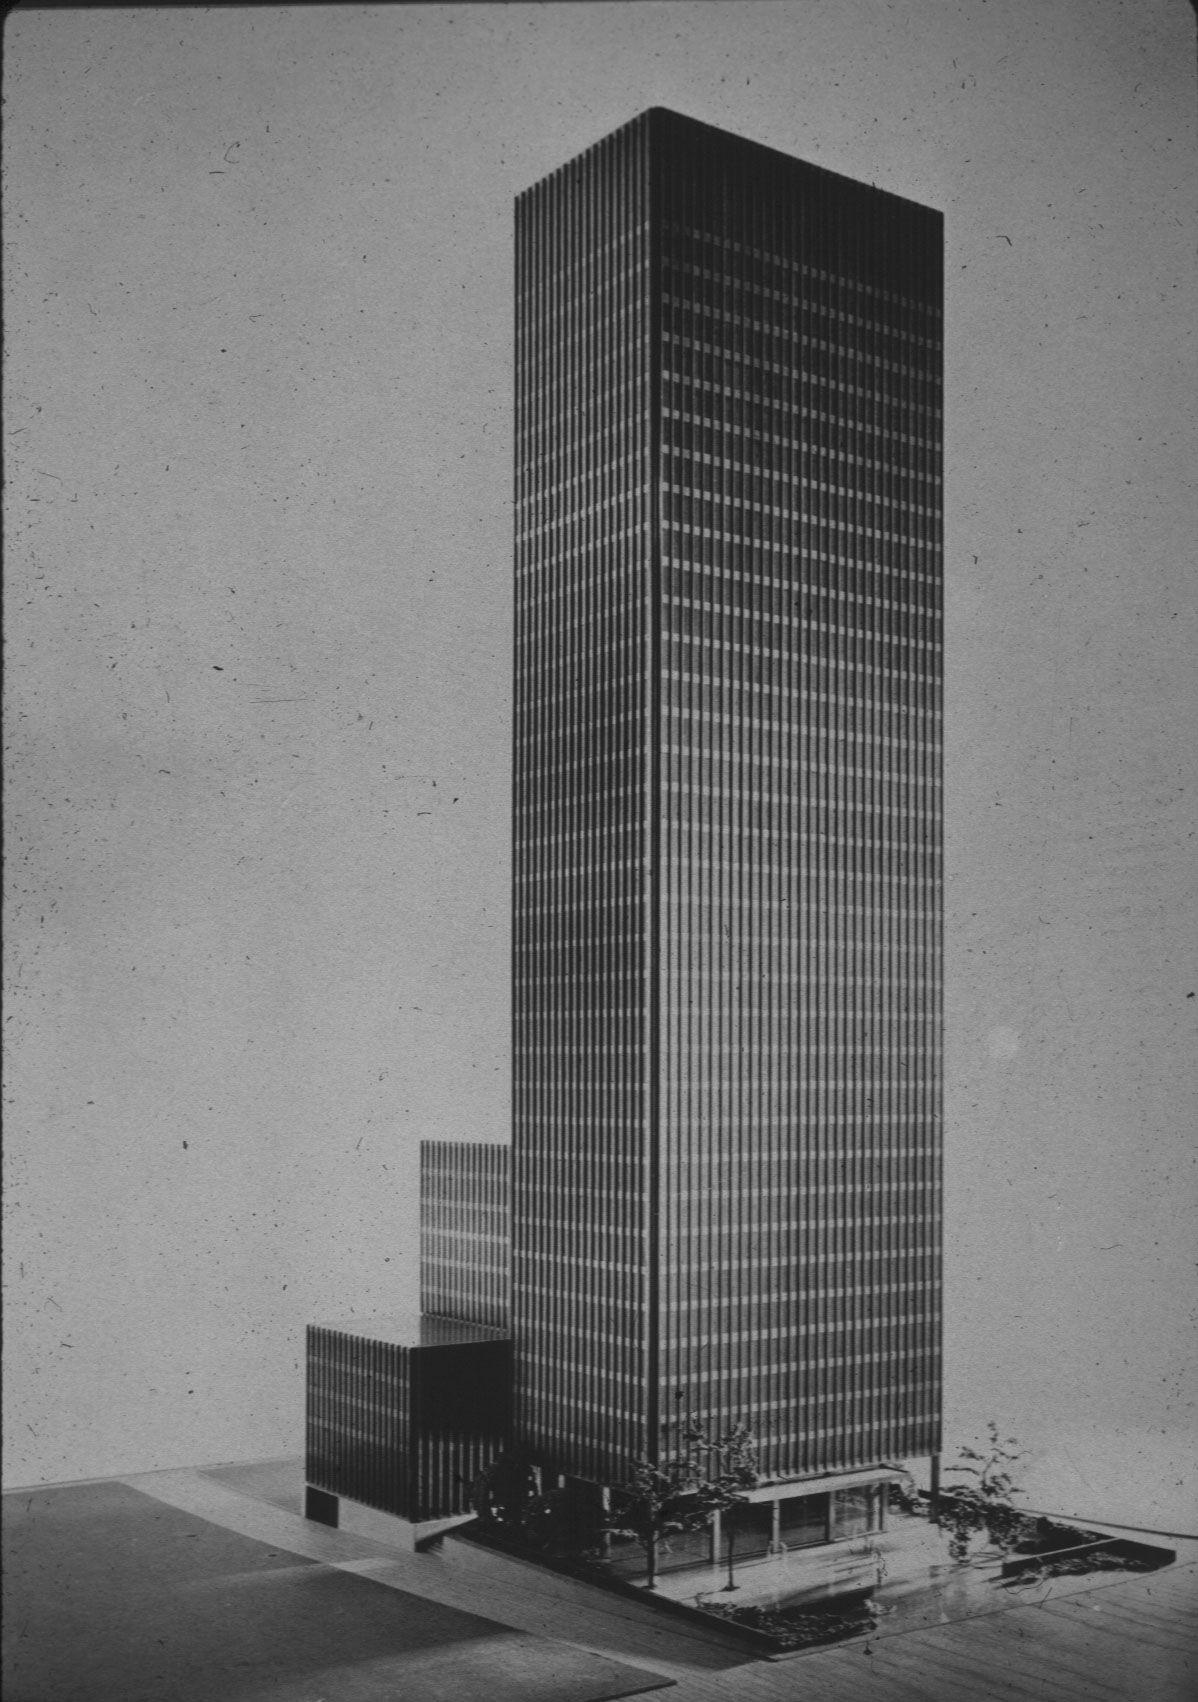 Villa tugendhat arkitalker mies van der rohe - Mies Van Der Rohe Seagram Building Chicago 1958